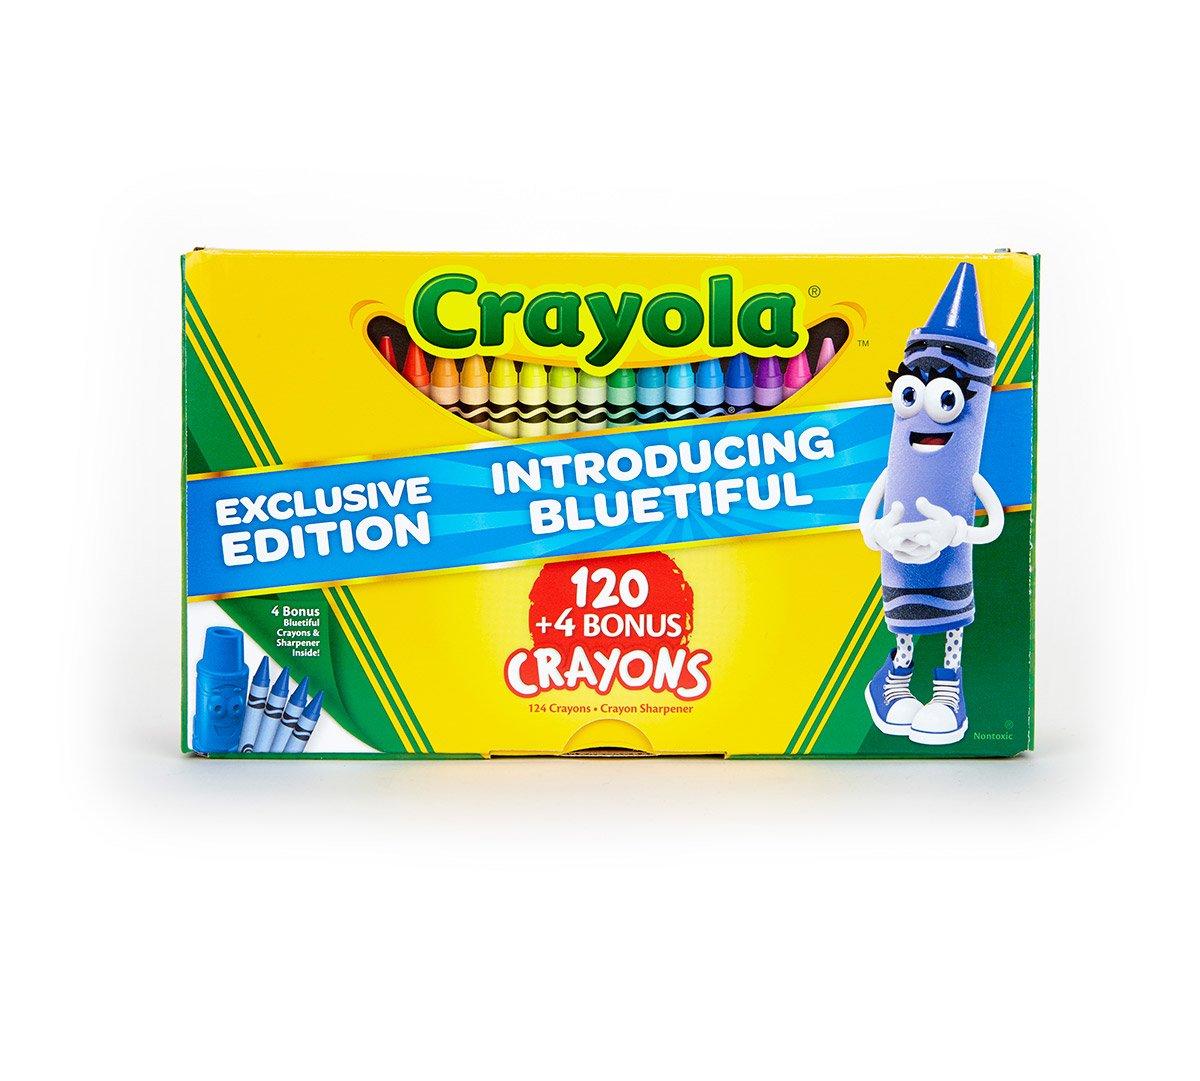 Crayola 124 count Crayons with Bluetiful